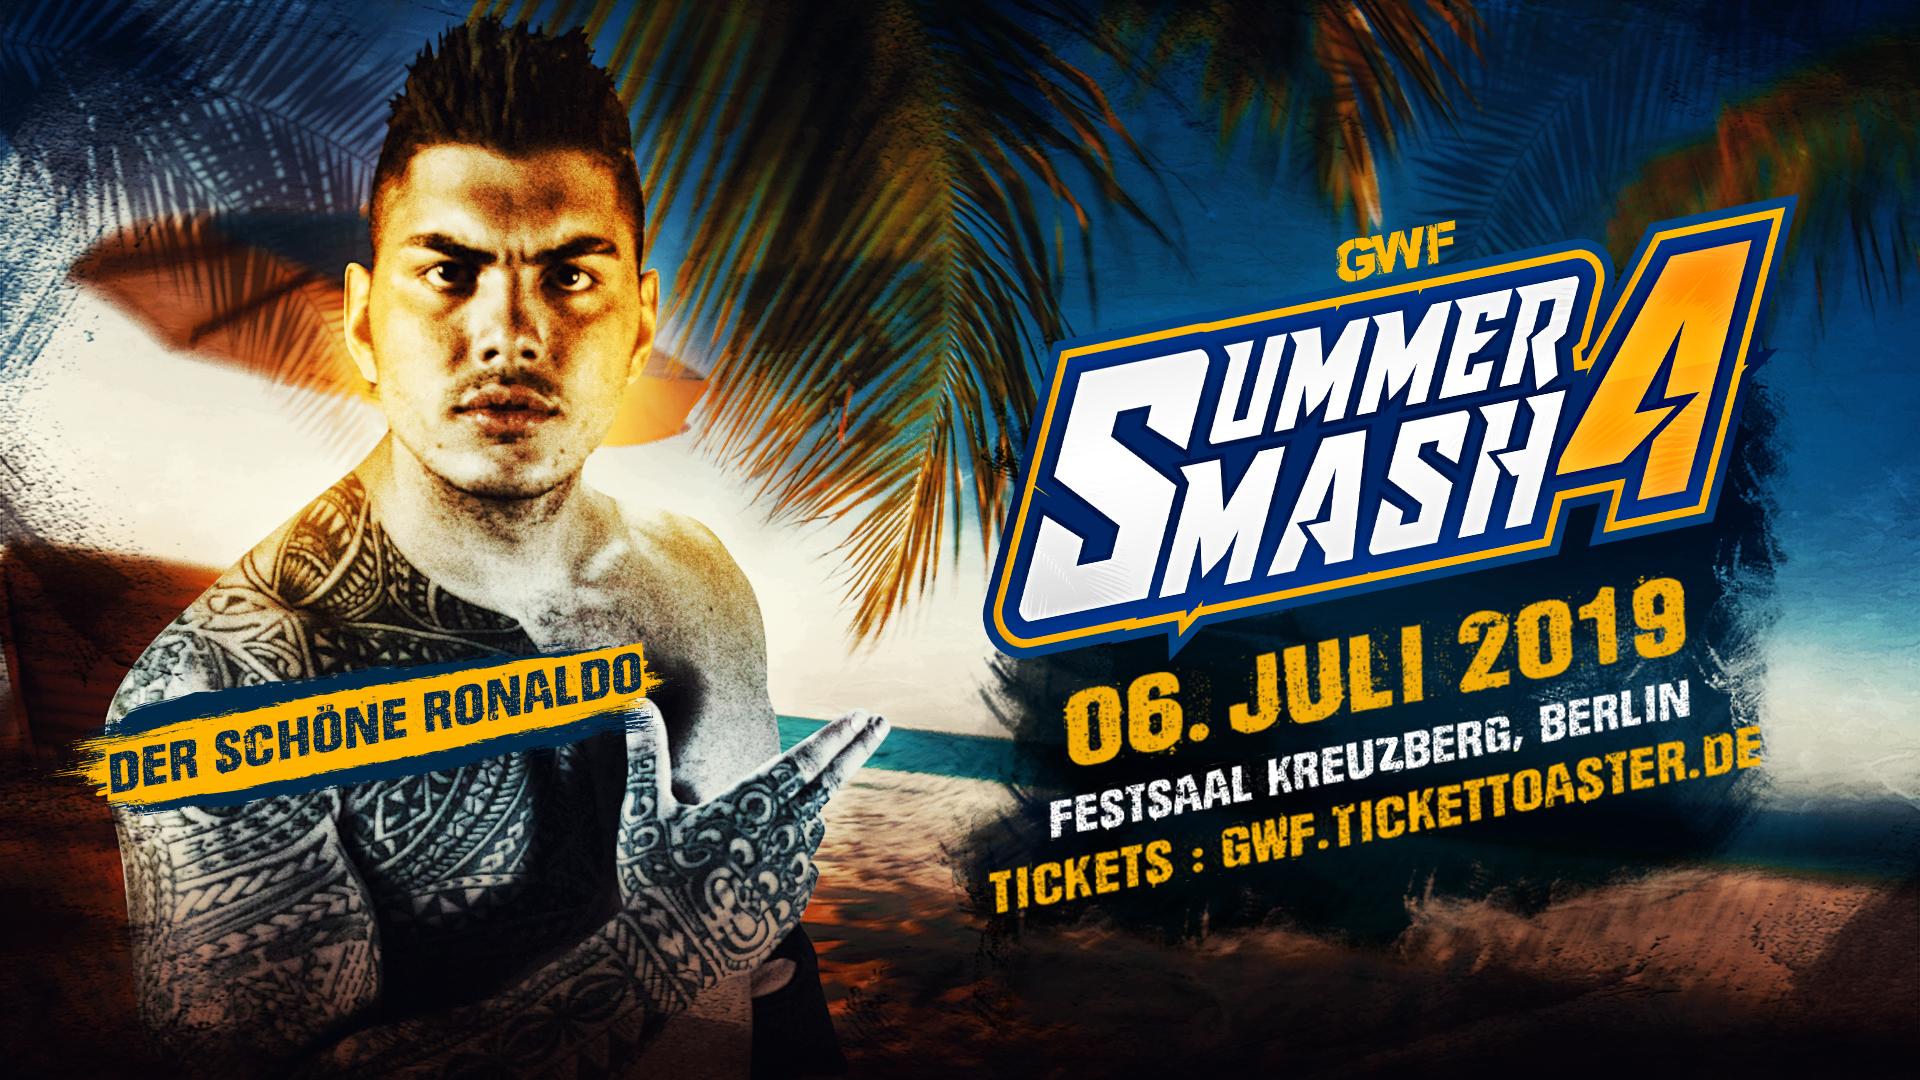 Summer Smash - Ronaldo V2